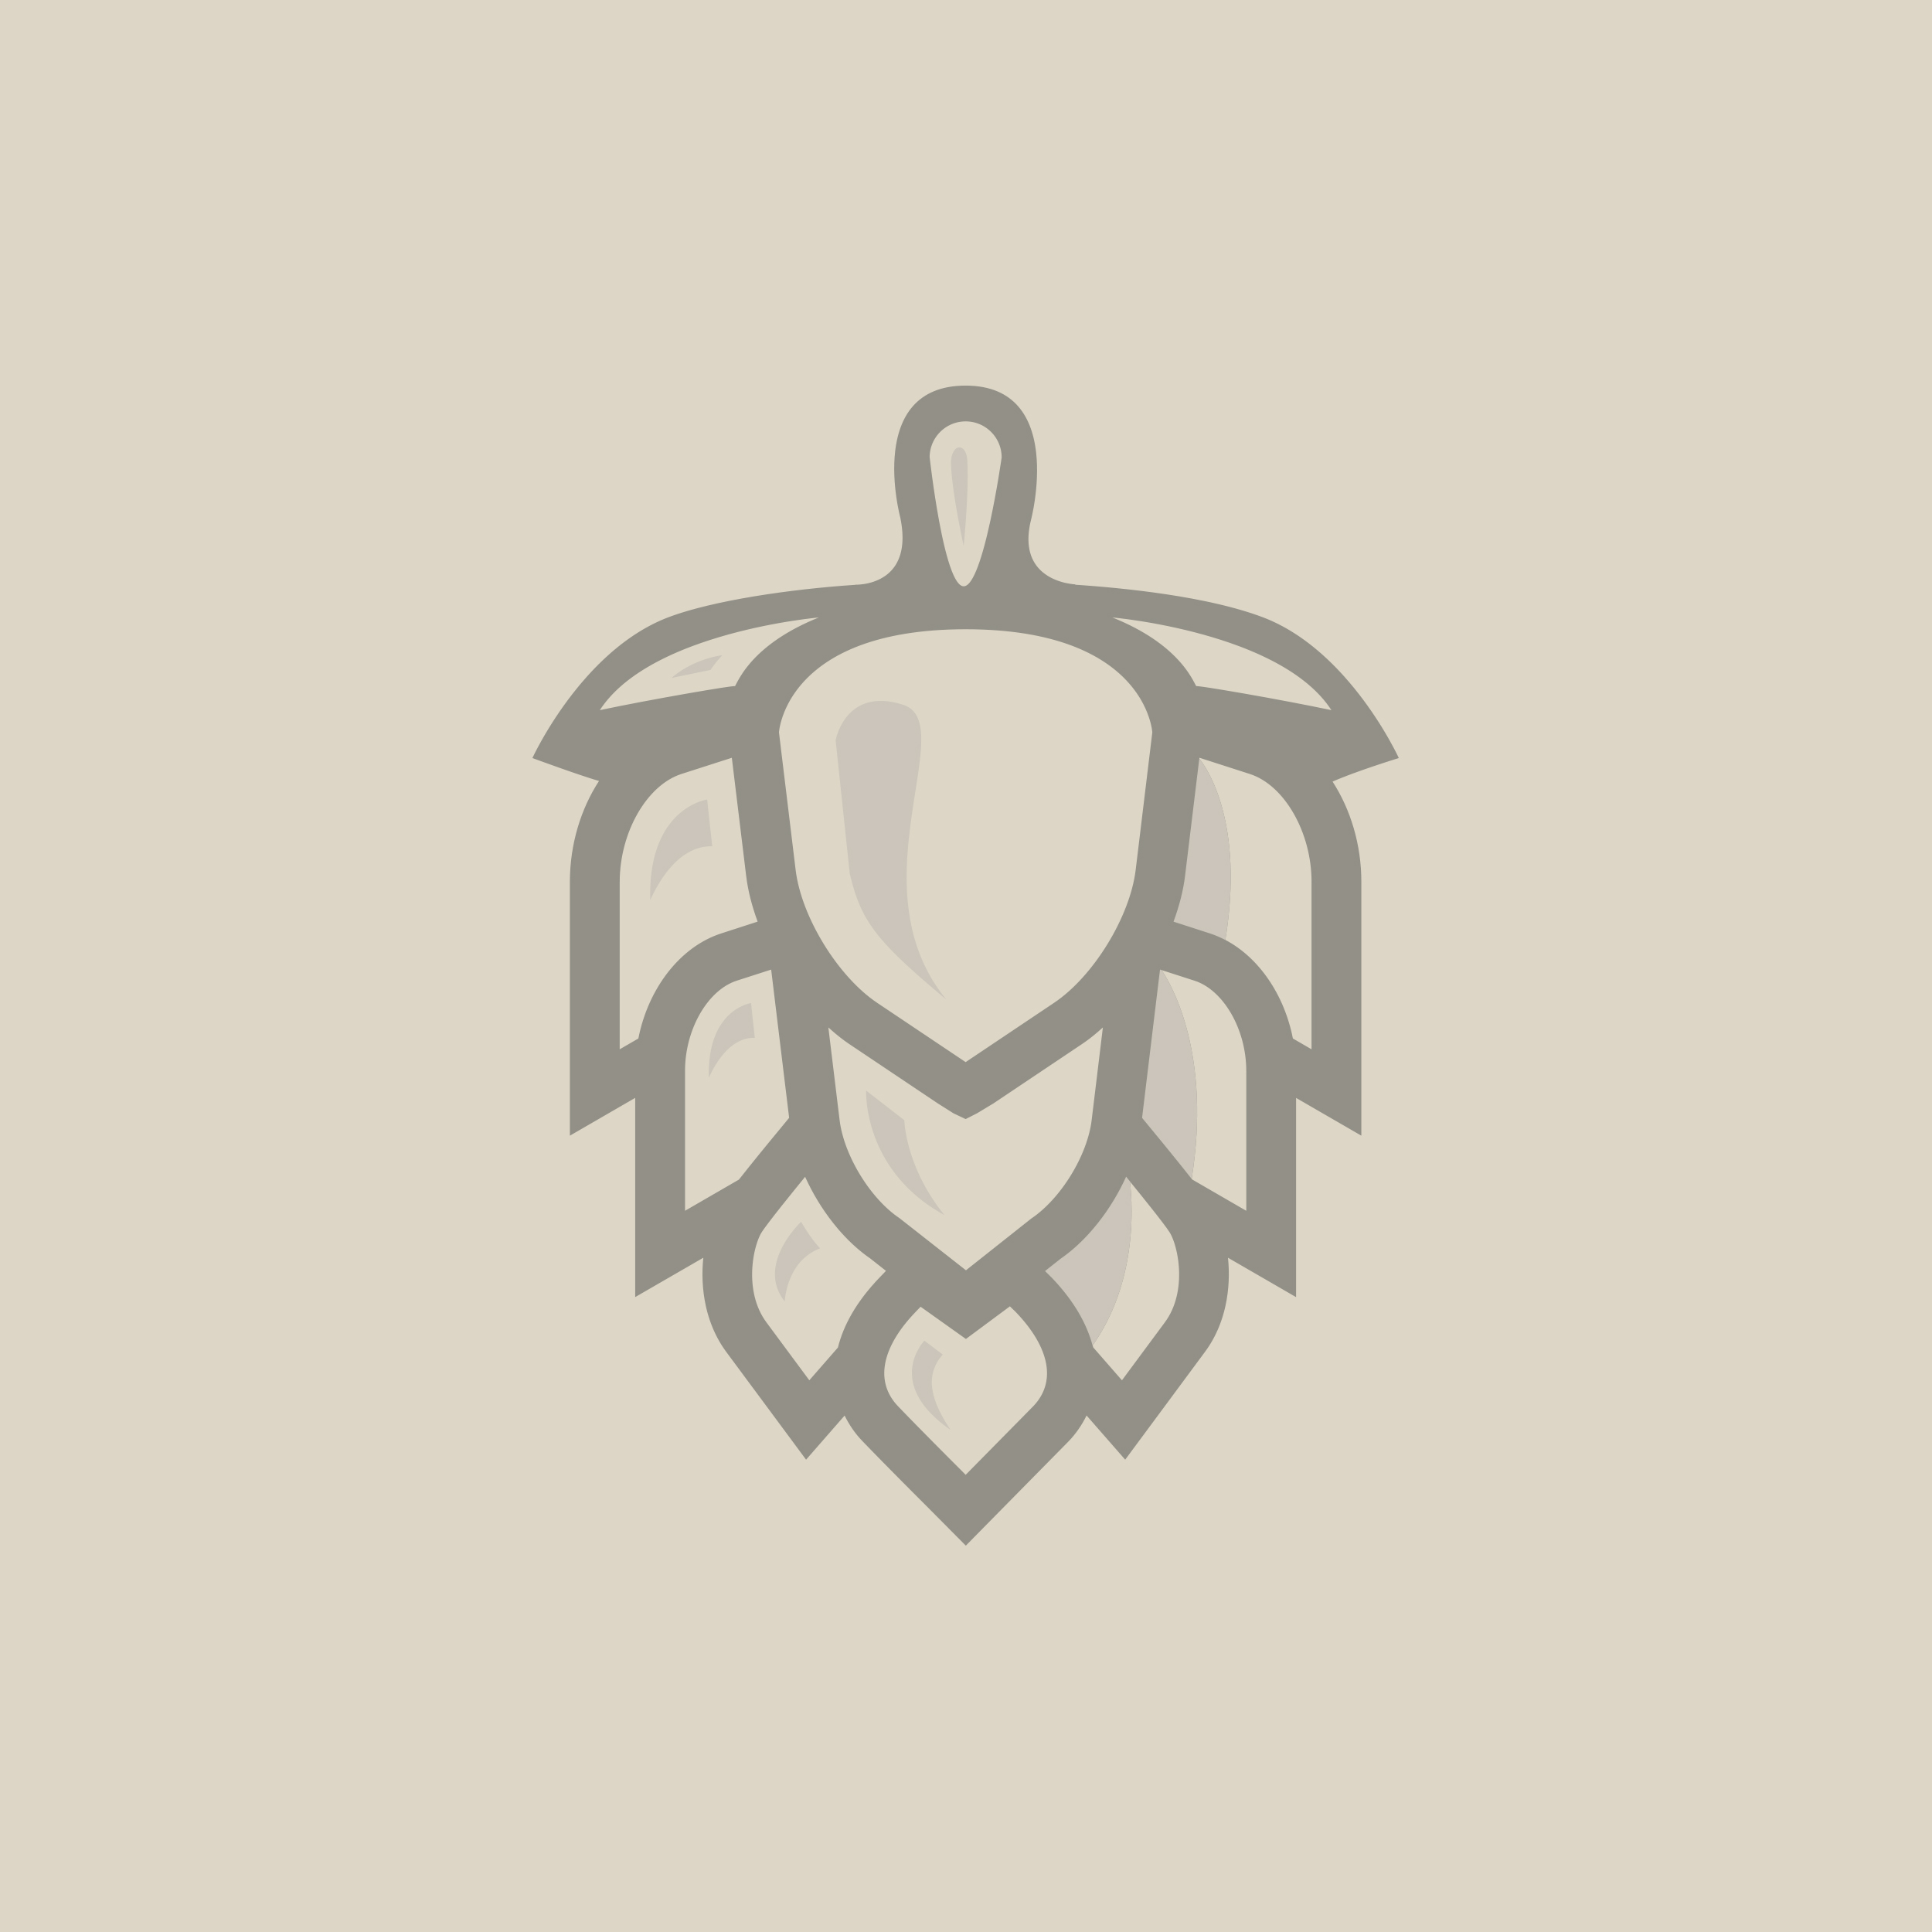 logos_0050_hop_icon.jpg